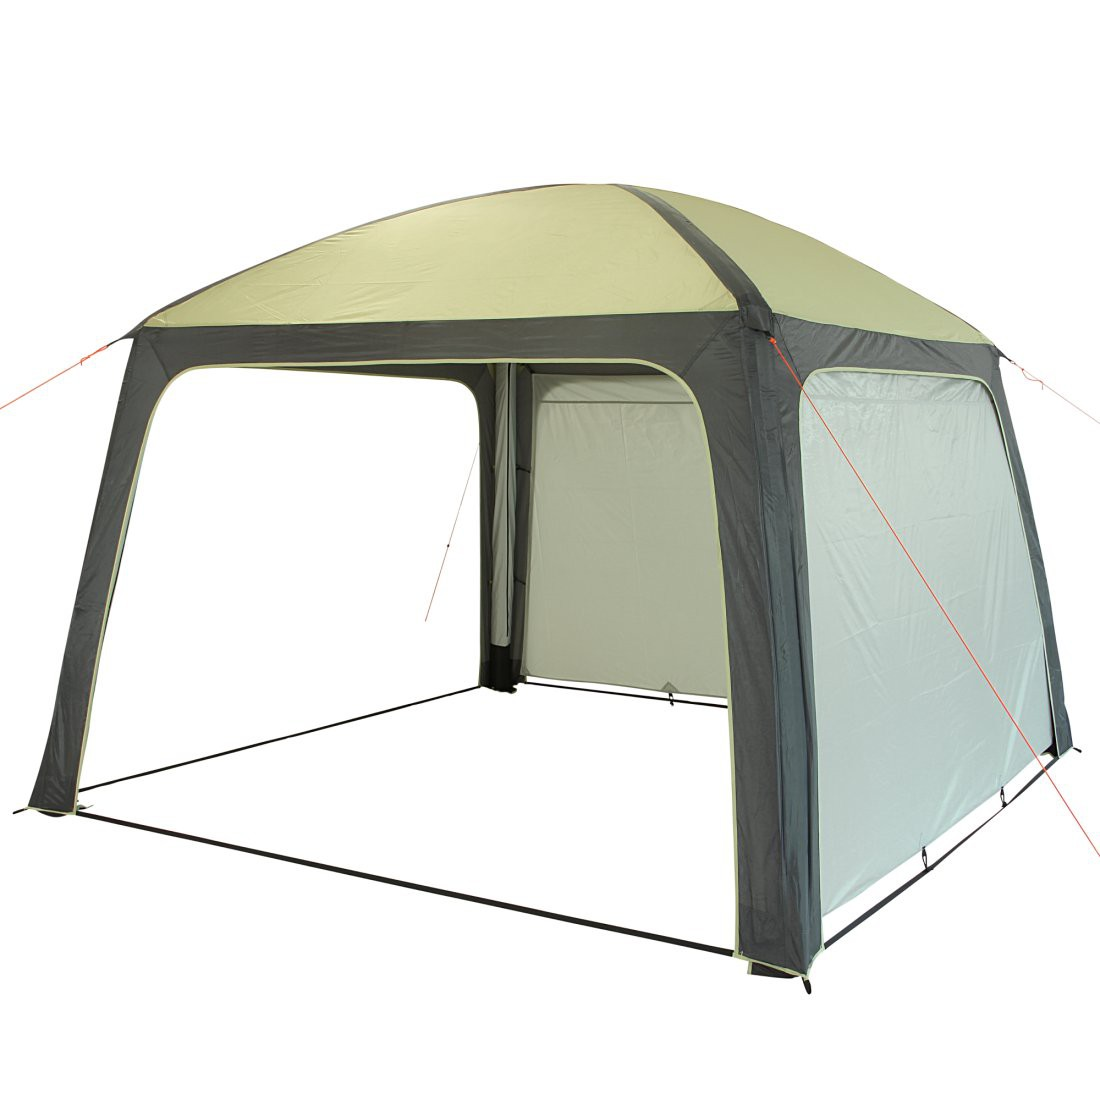 Frisch Pavillons bei Camping Outdoor online kaufen IZ55